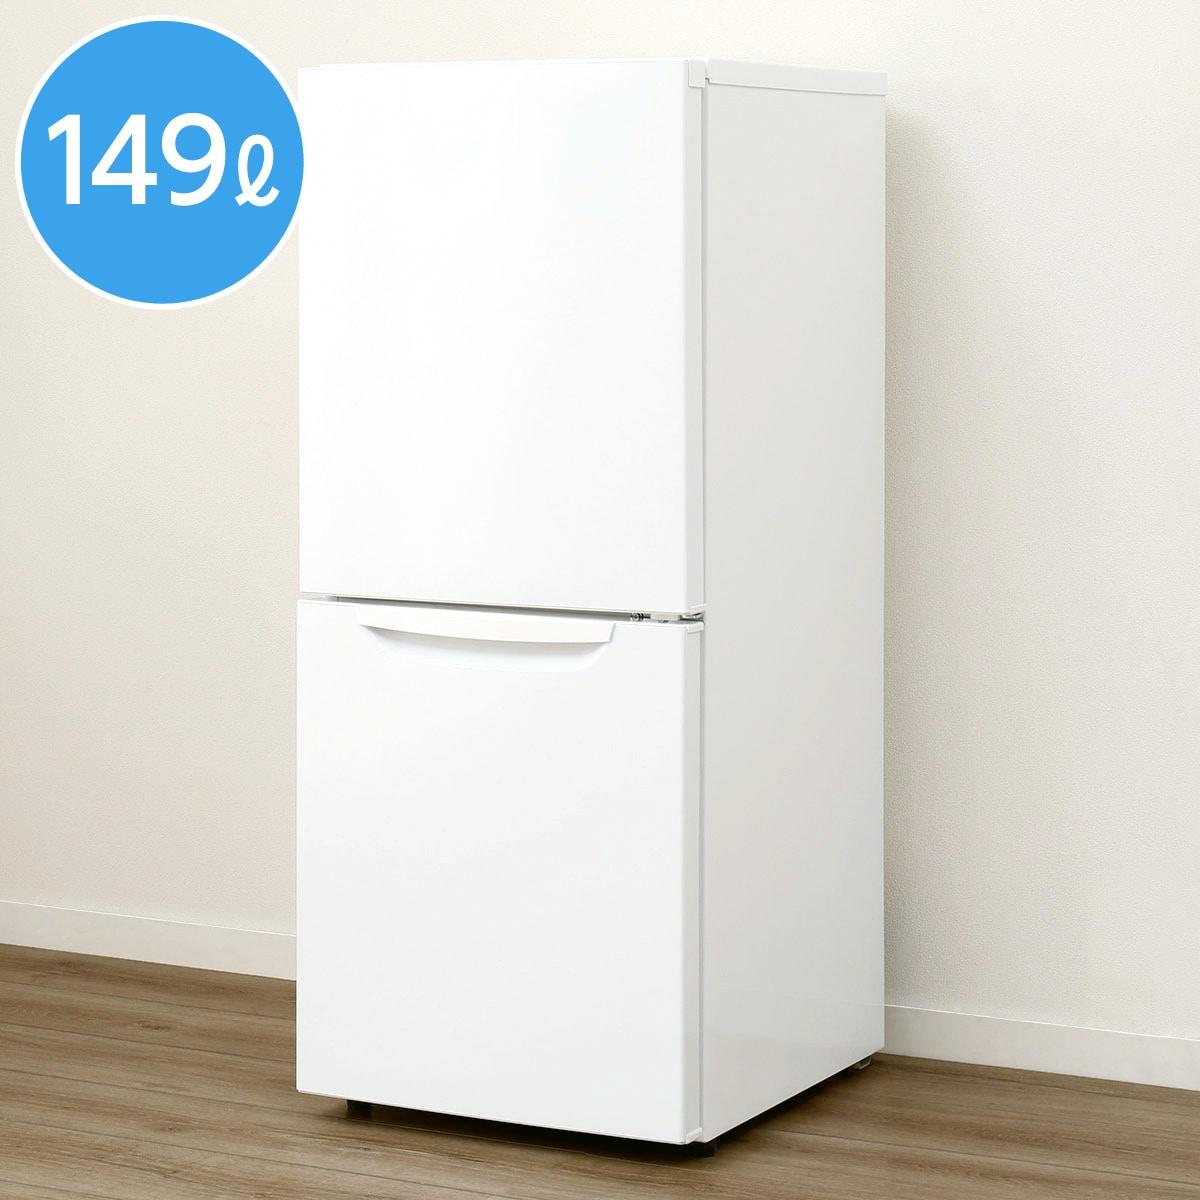 149L容量 ファン式2ドア冷蔵庫 (NTR-149WA)